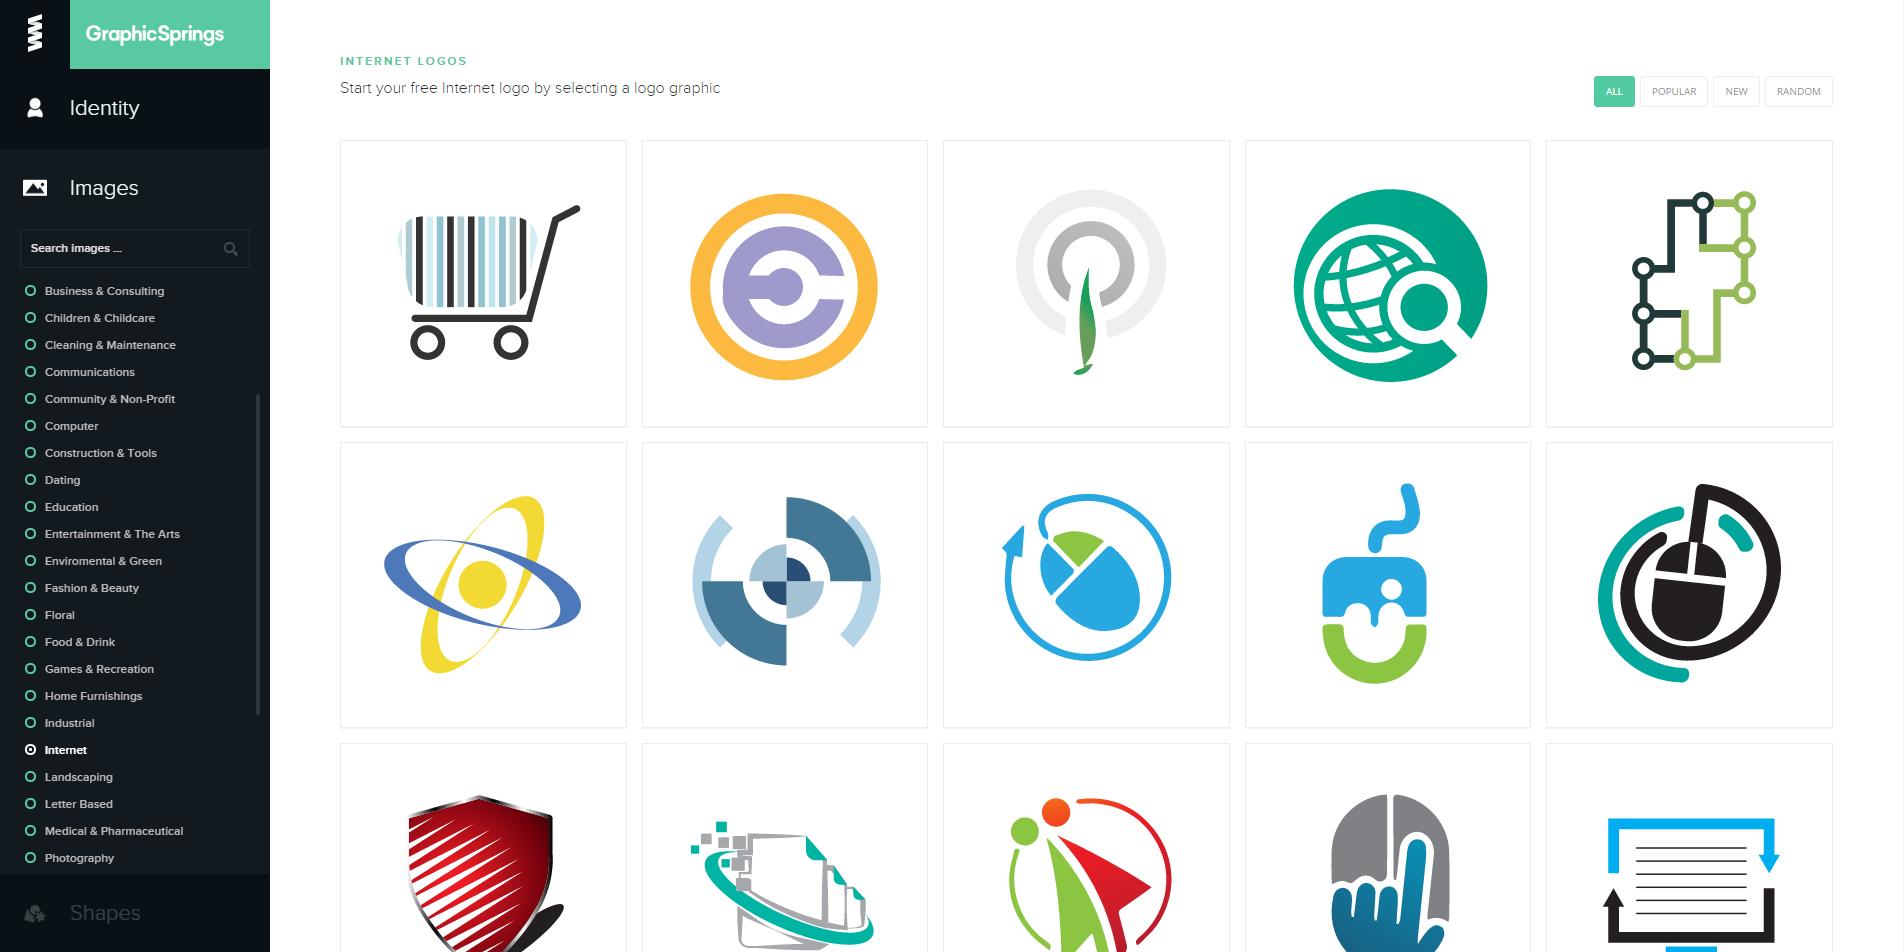 Thiet ke logo online free bang Graphicsprings